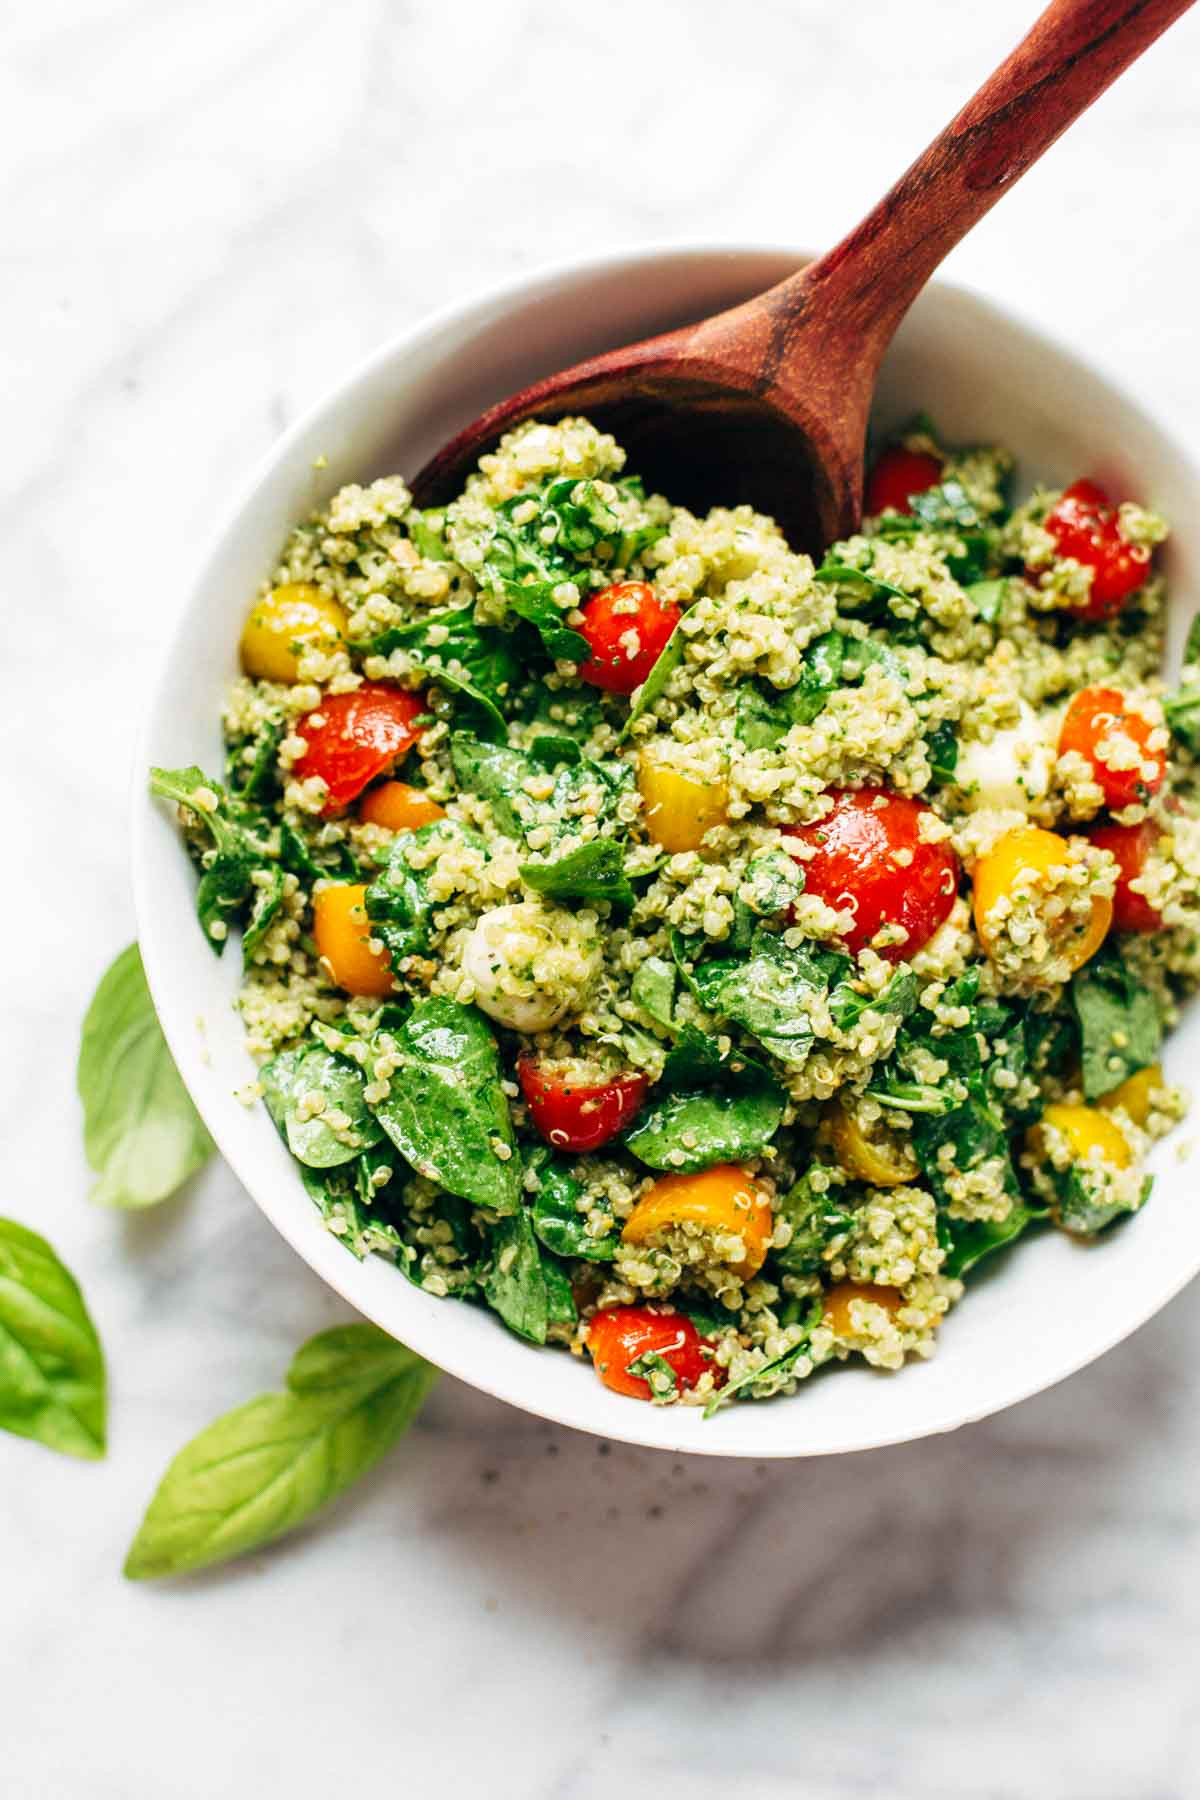 Easy Summer Vegetarian Recipes  Green Goddess Quinoa Summer Salad Recipe Pinch of Yum